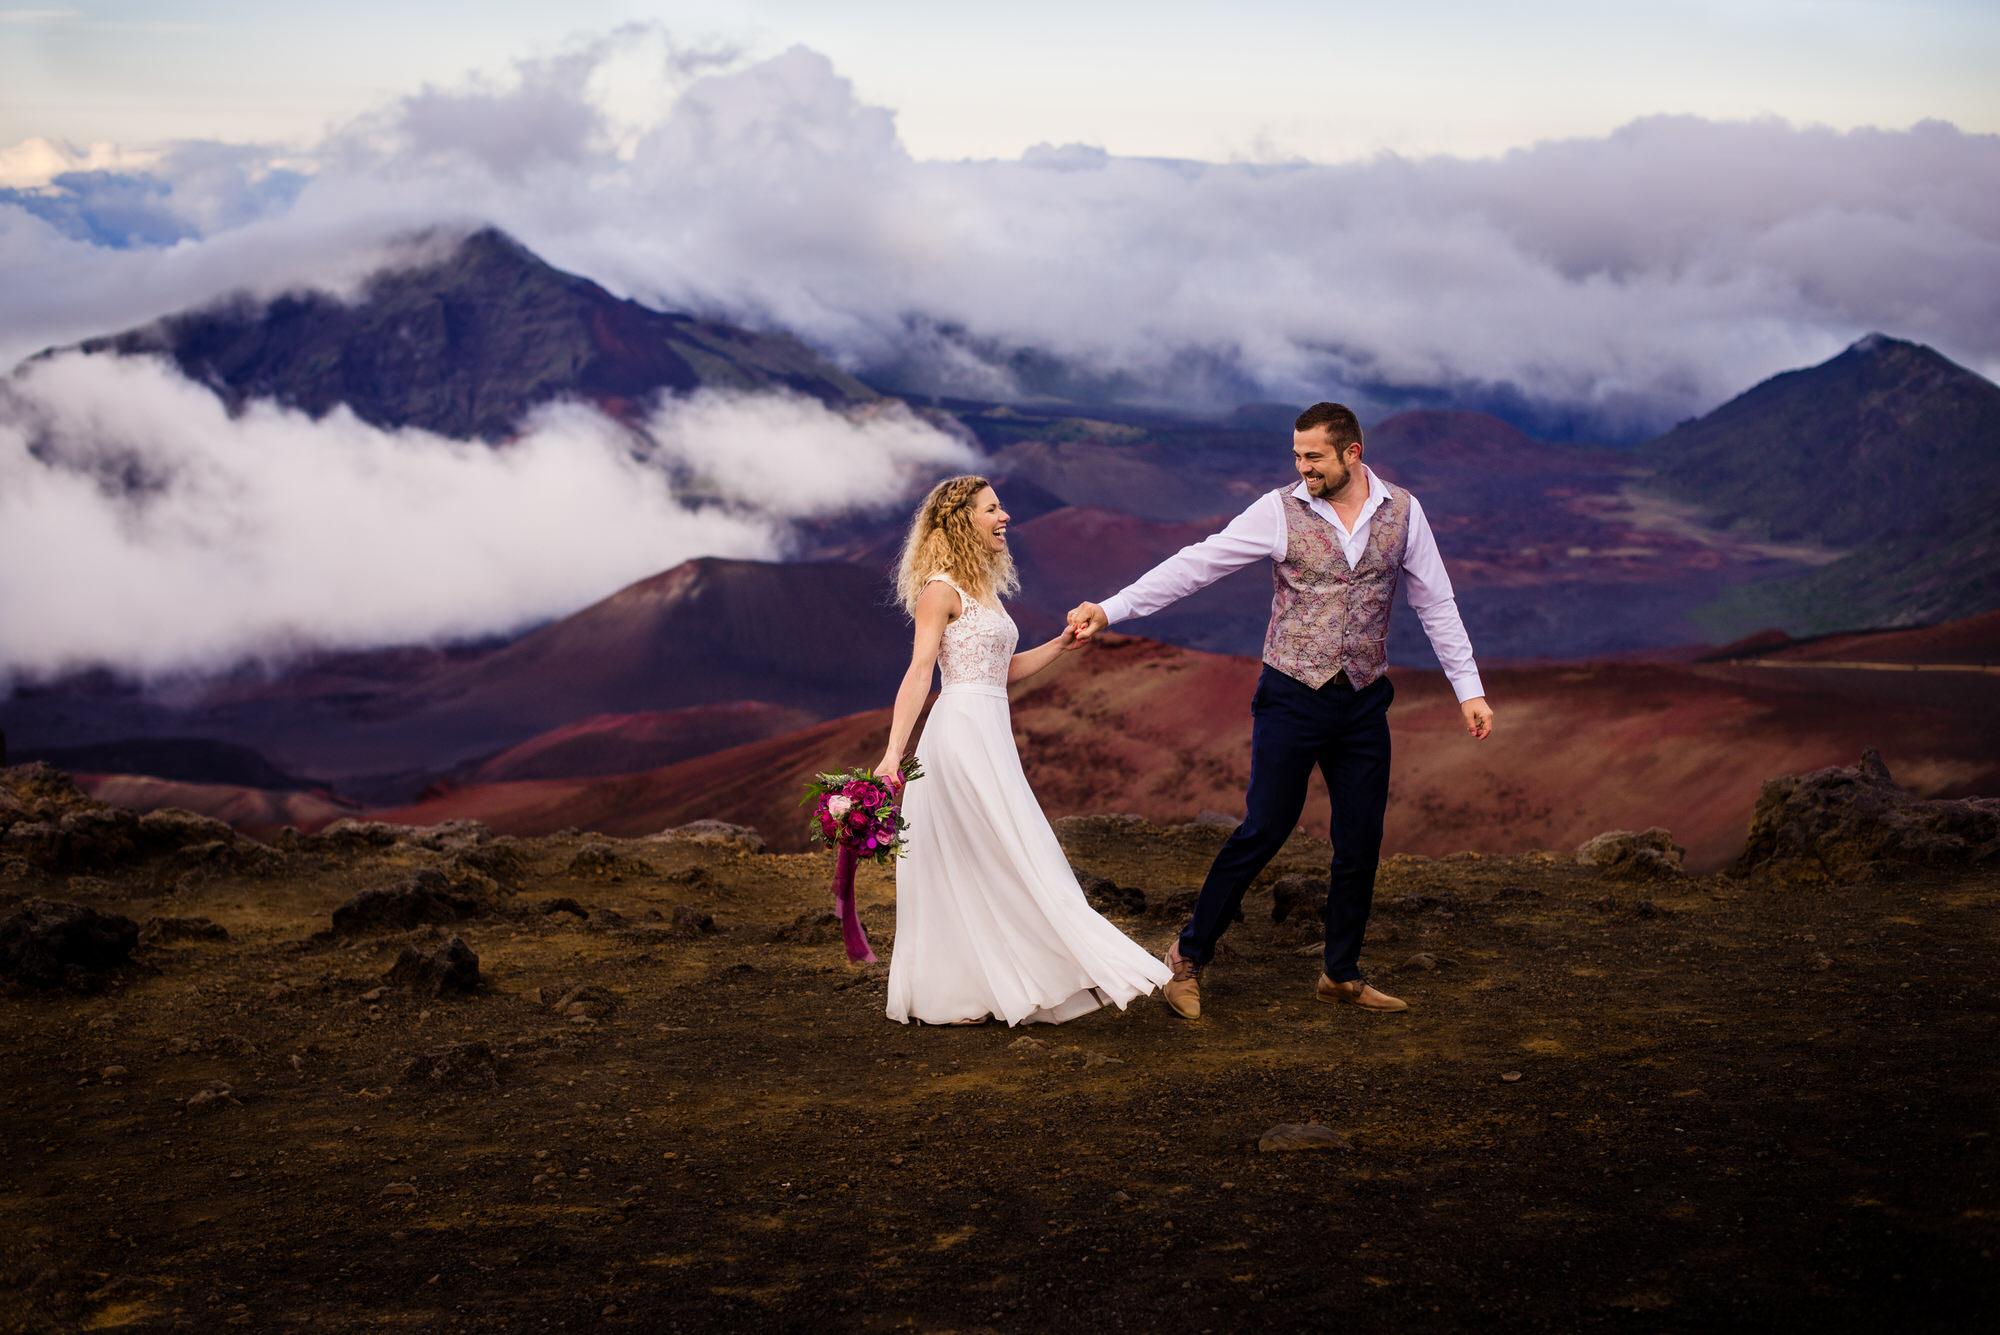 haleakala elopement couple - photo by Angela Nelson Photography